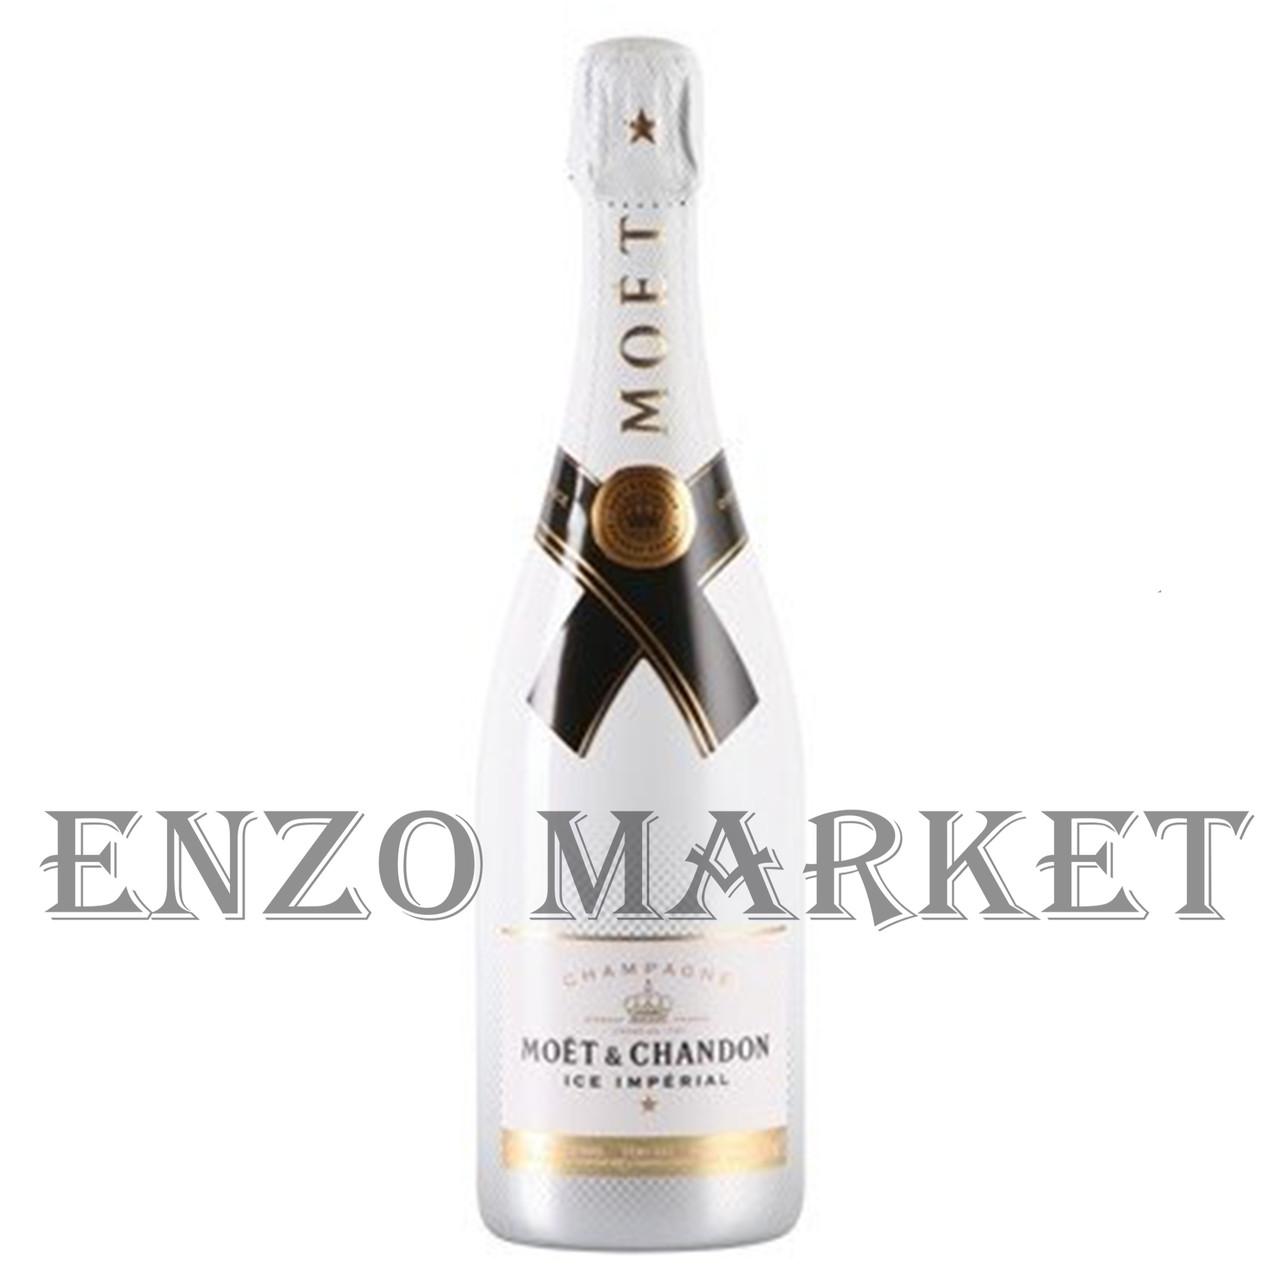 Шампанское Moet Chandon Ice Imperial (Моет Шандон Айс) 12%, 0,75 литра